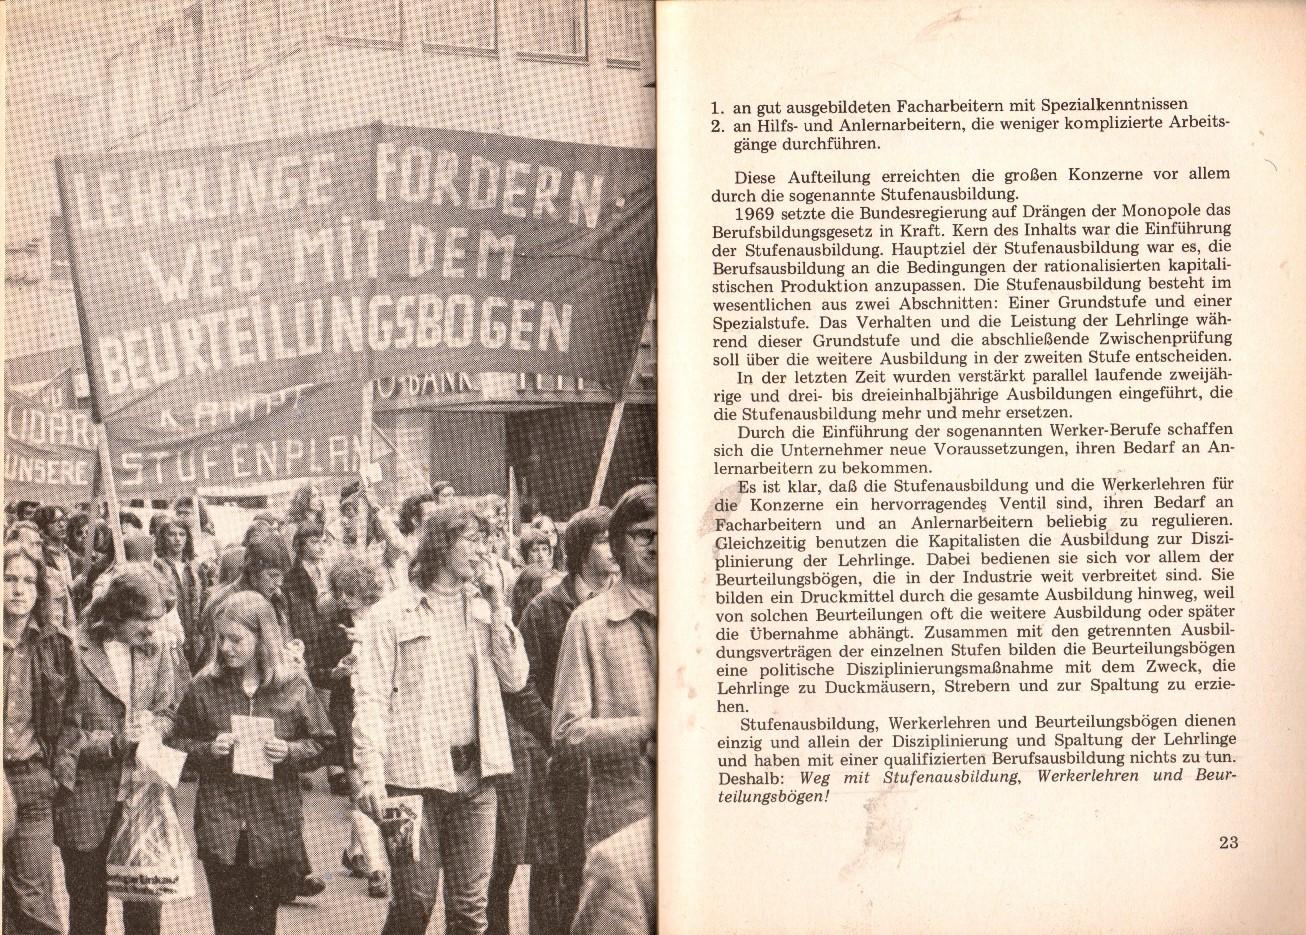 KABD_1977_Jugend_Zukunft_14